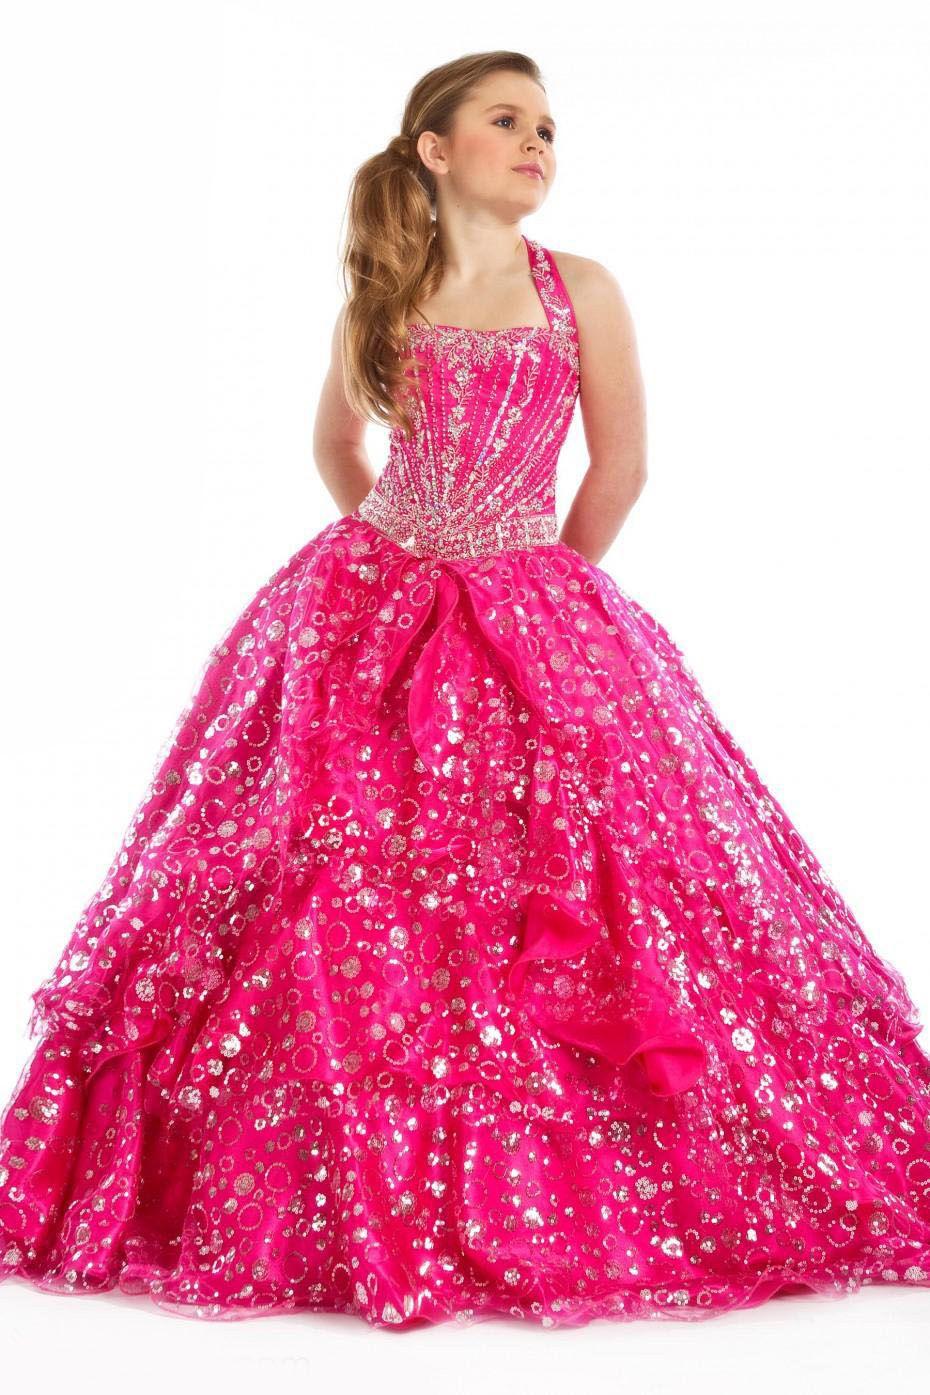 Encontrar vestidos elegantes para niñas,vestidos elegantes para ...